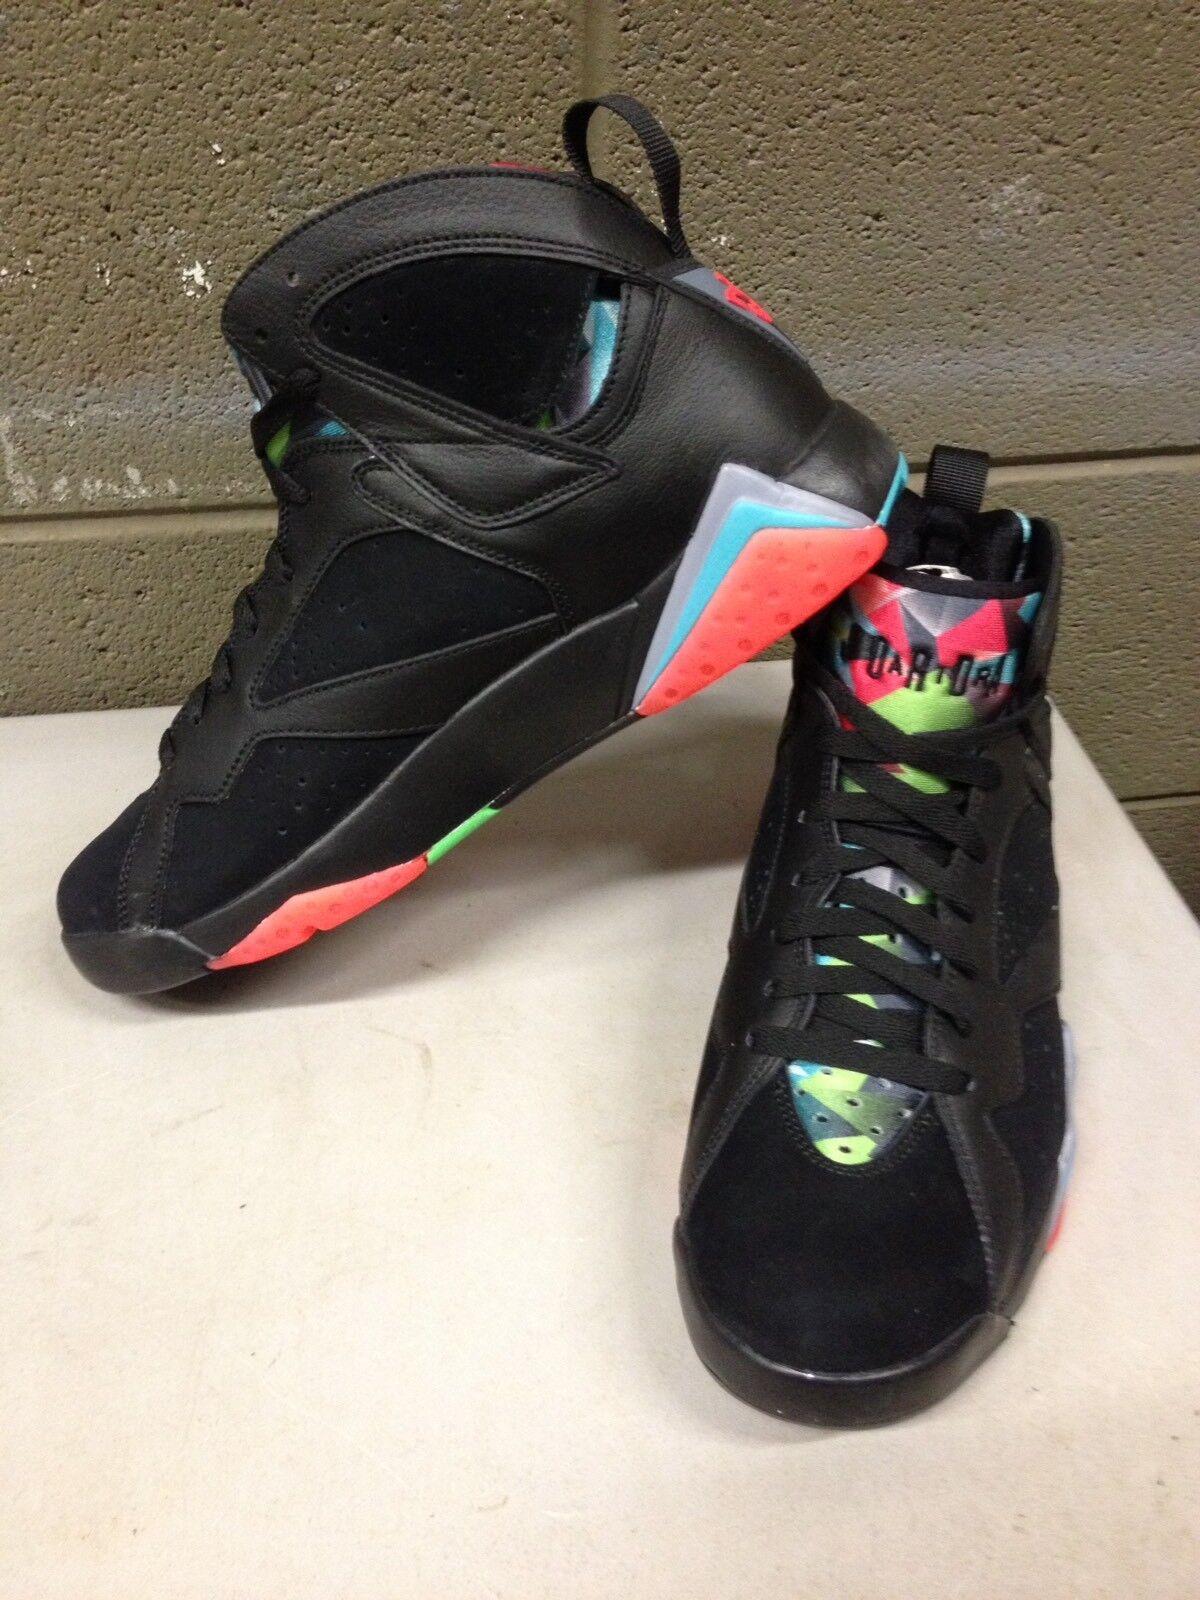 Nike Air Jordan VII Retro 7 Barcelona Nights 705350-007 Marvin the Martian 11